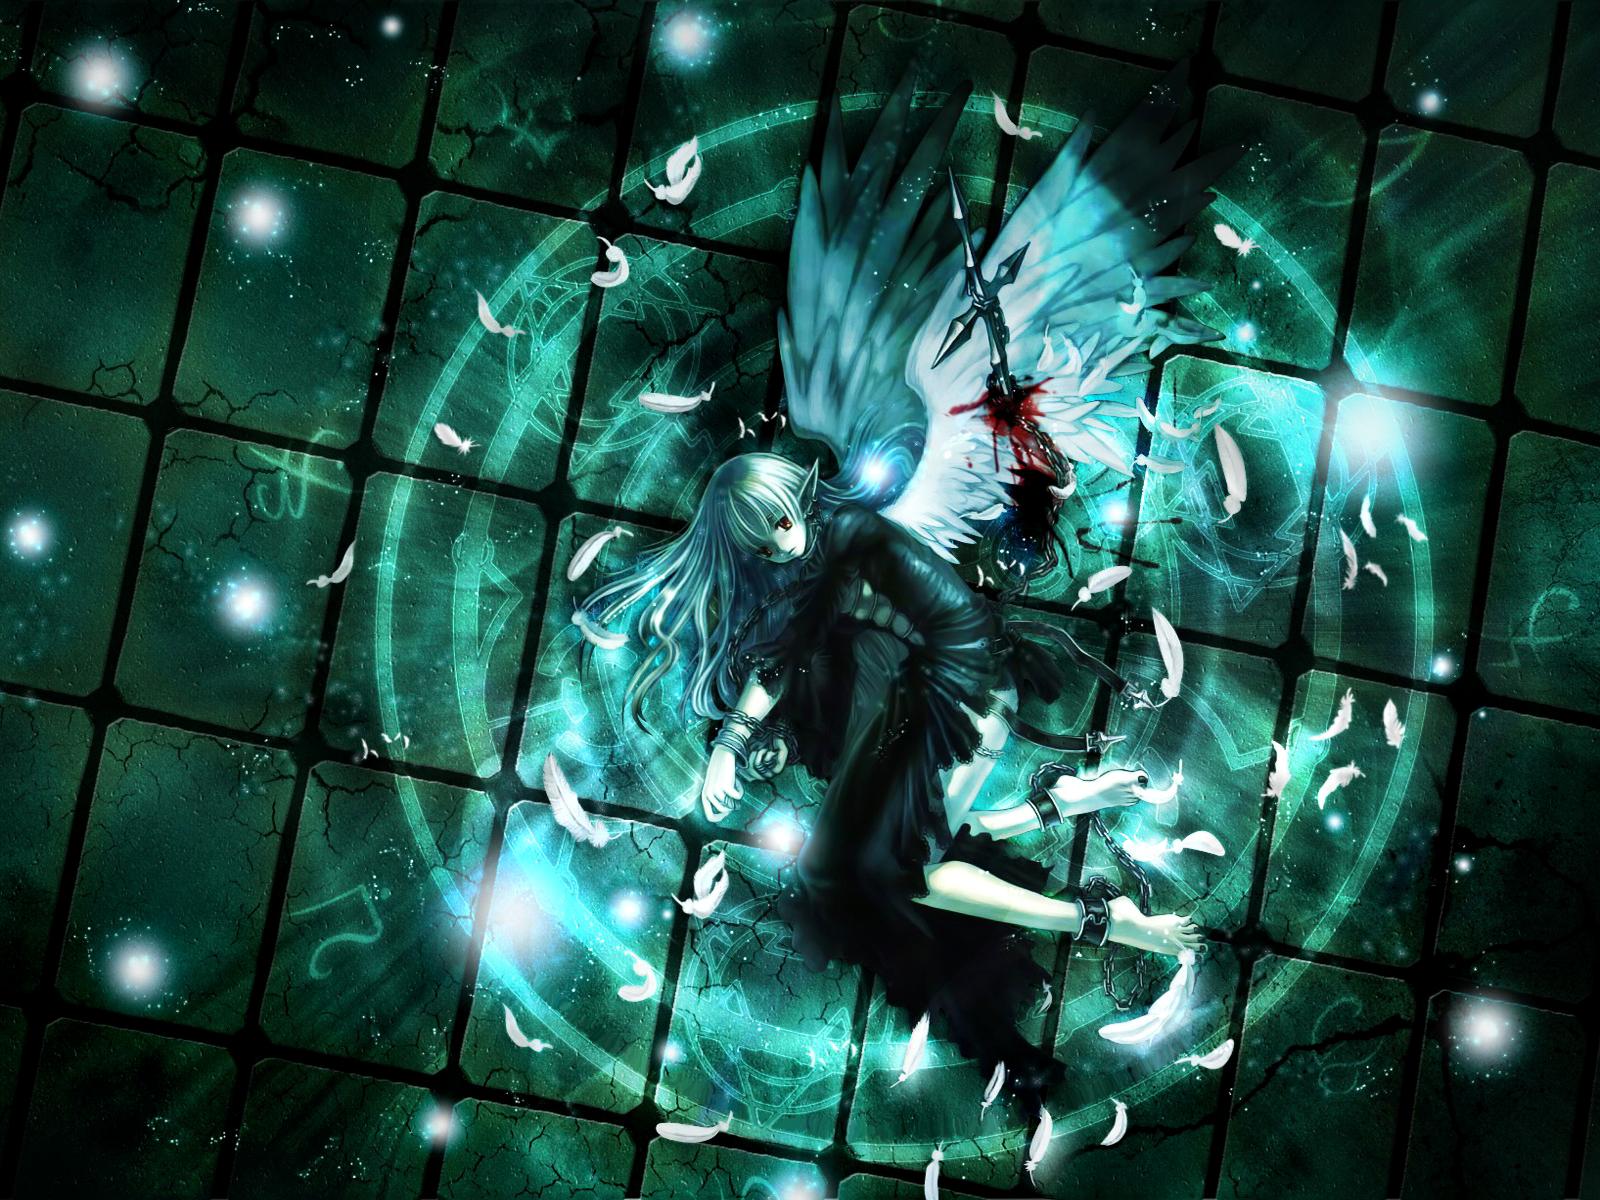 Hd Anime Wallpapers-11 - Abyss Wallpaper Anime Hd - HD Wallpaper